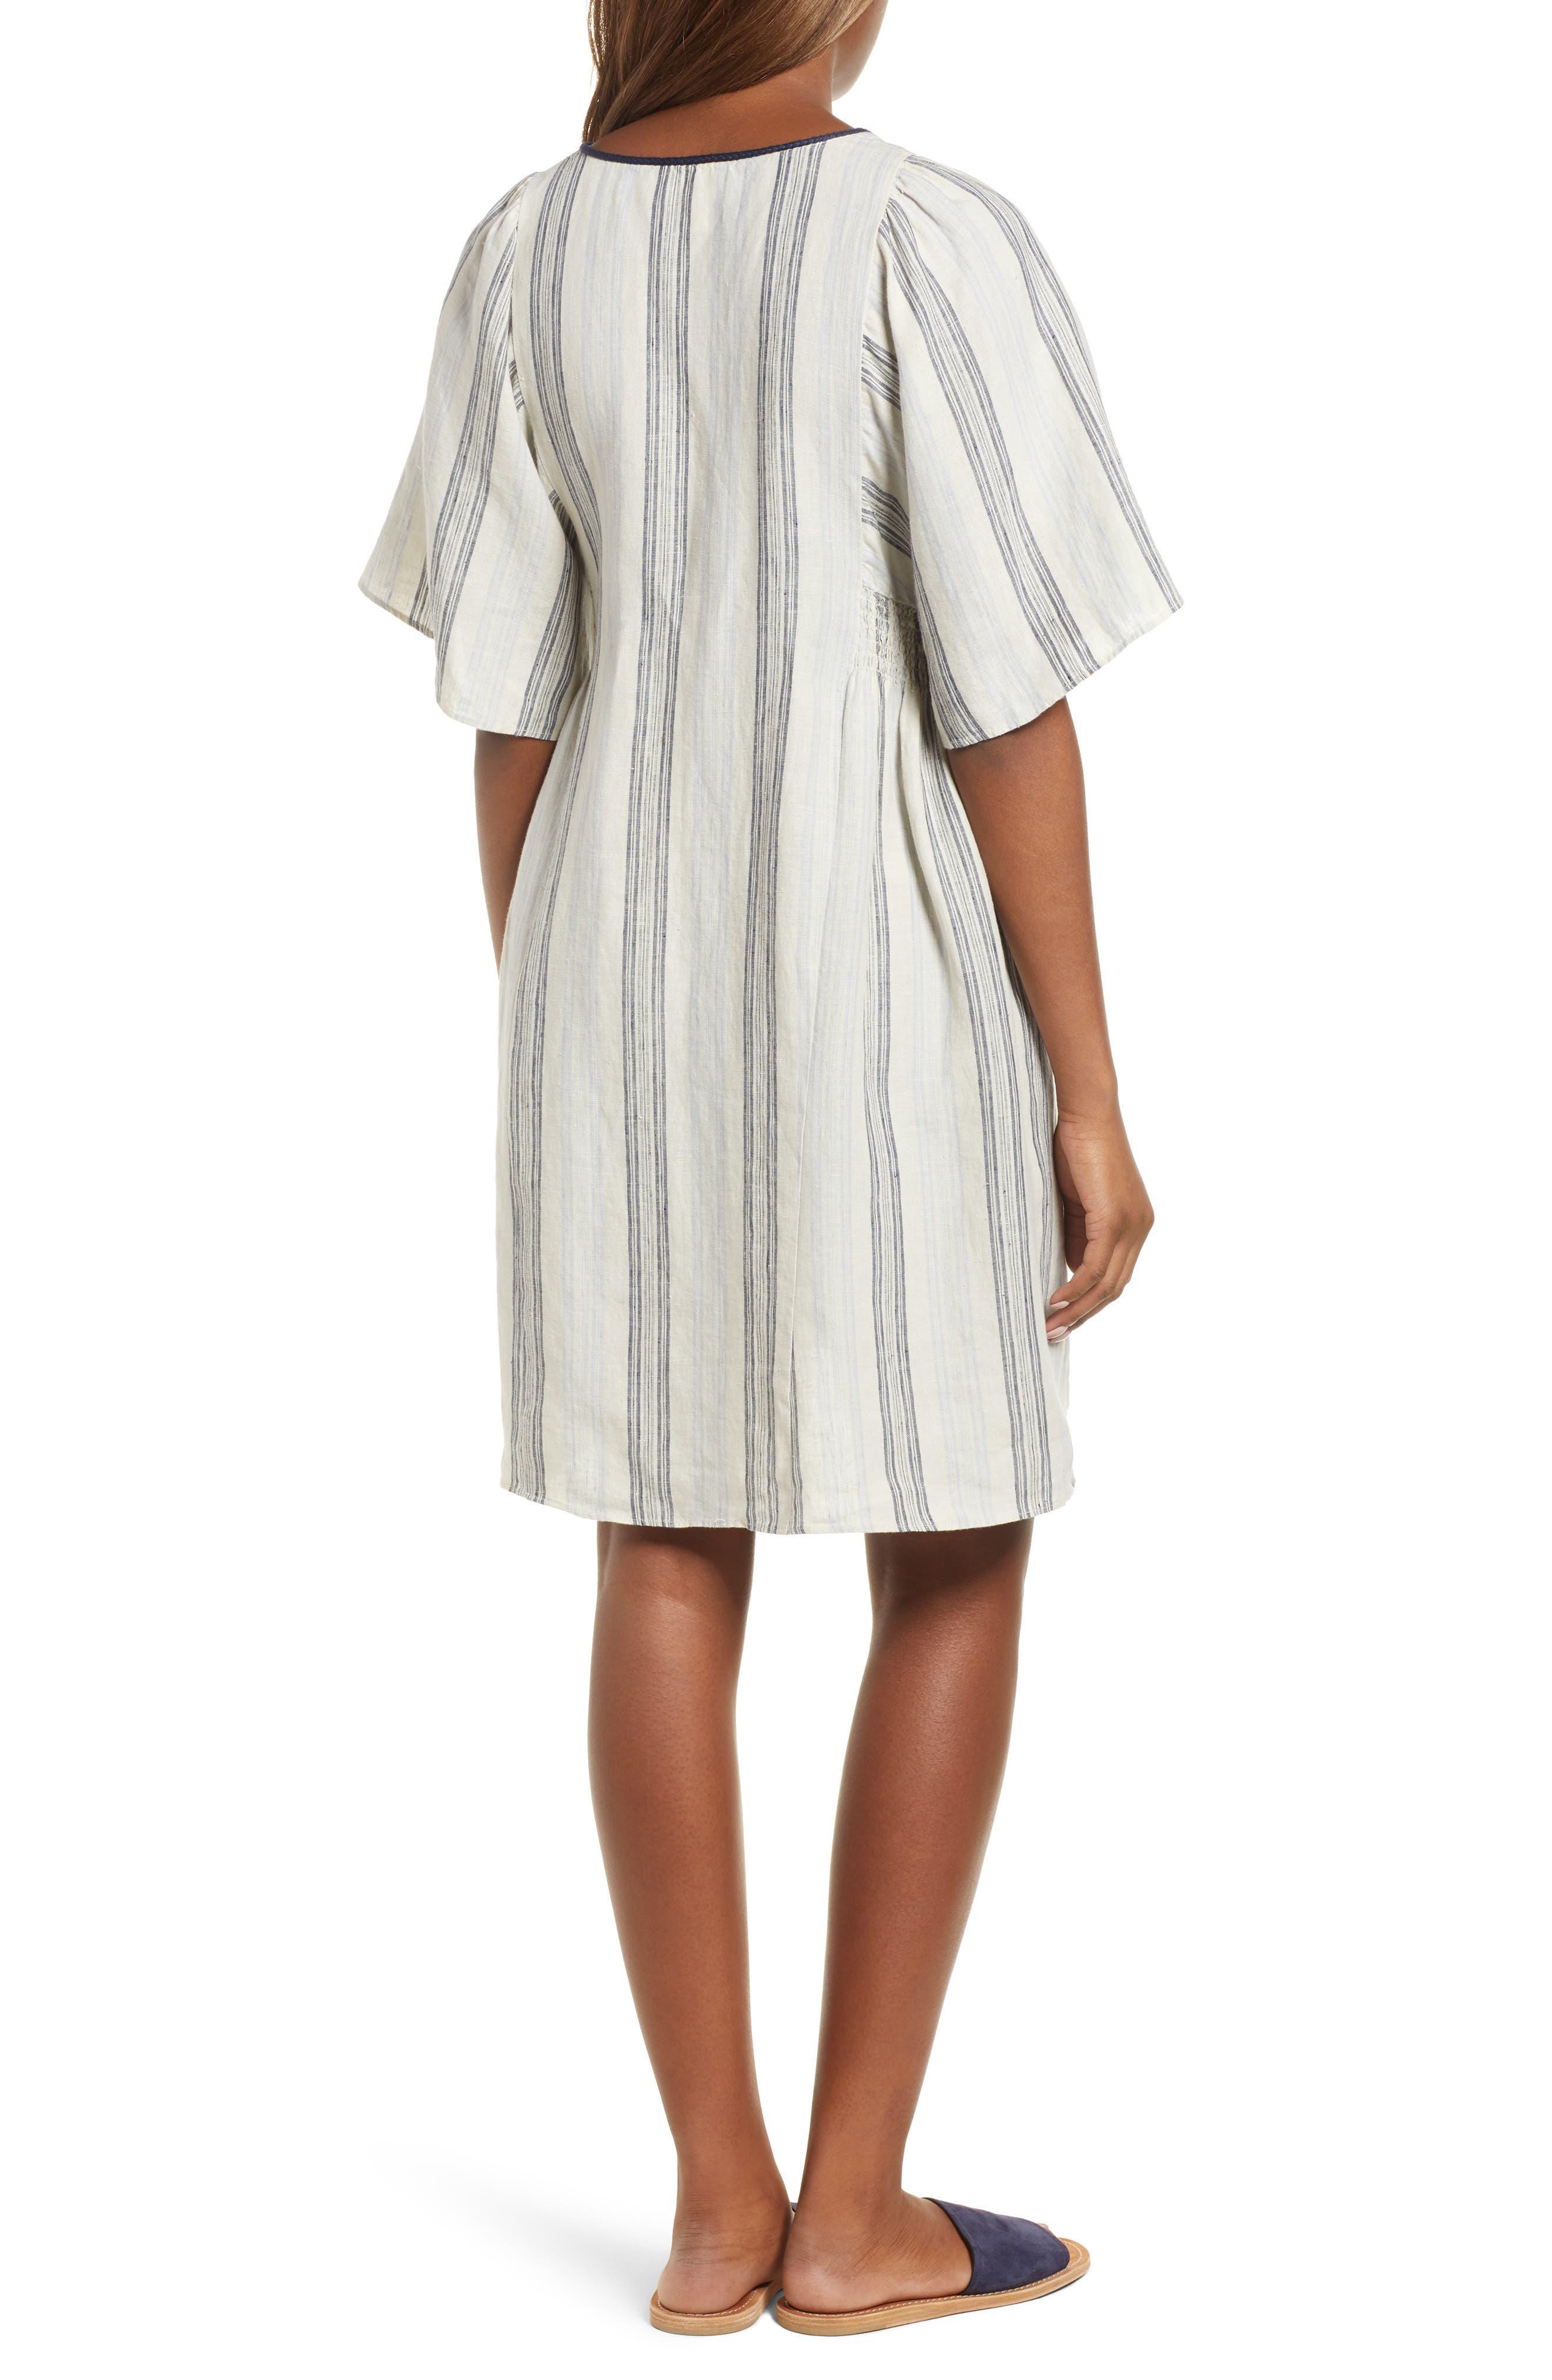 Stripe Linen Keyhole Shift Dress,                             Alternate thumbnail 2, color,                             Beige Rainy Day Frankie Stripe